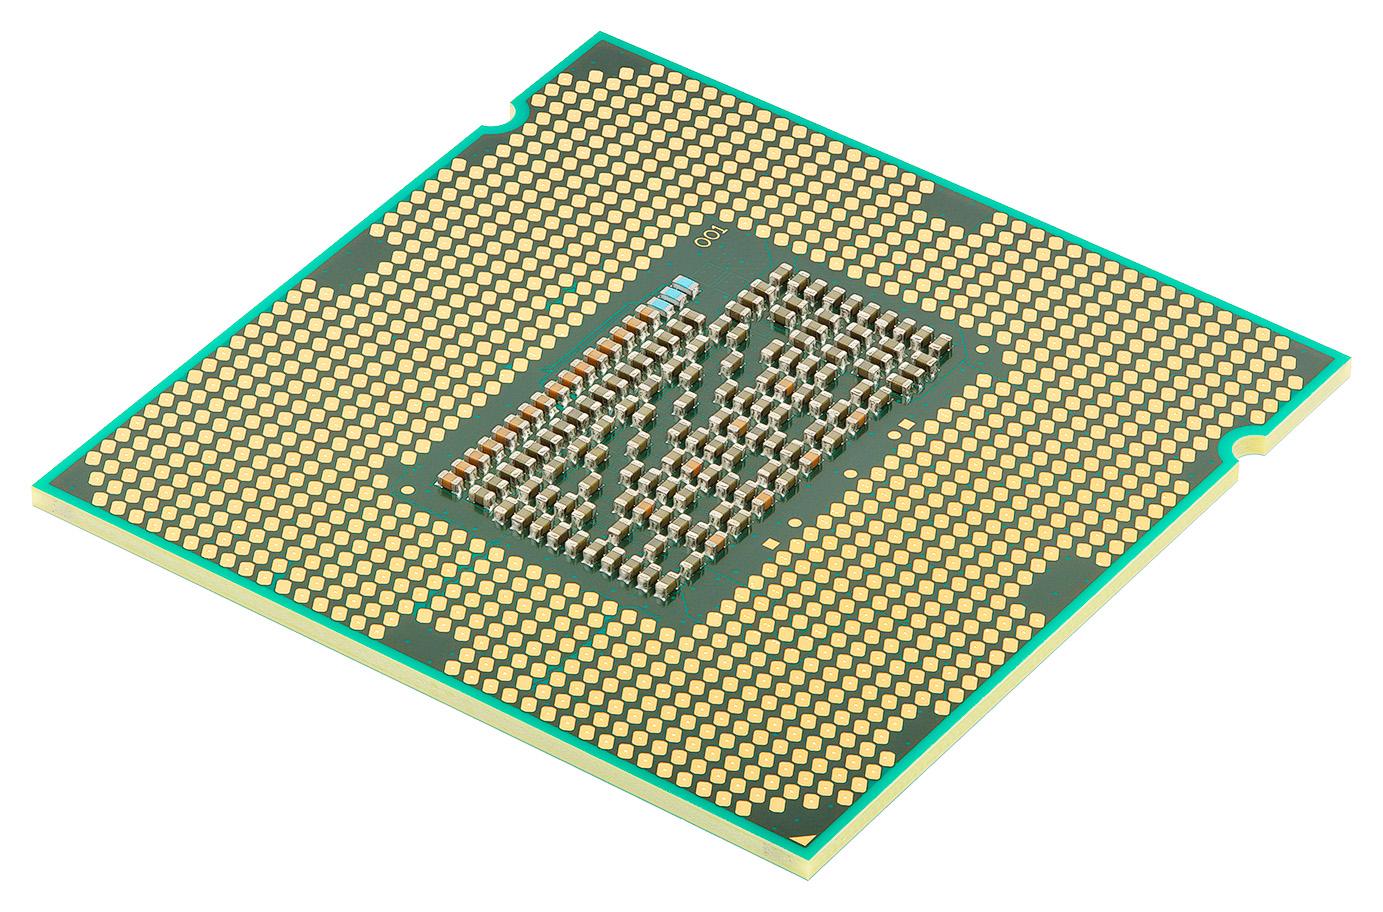 Intel Core i7 2600K CPU bottom view